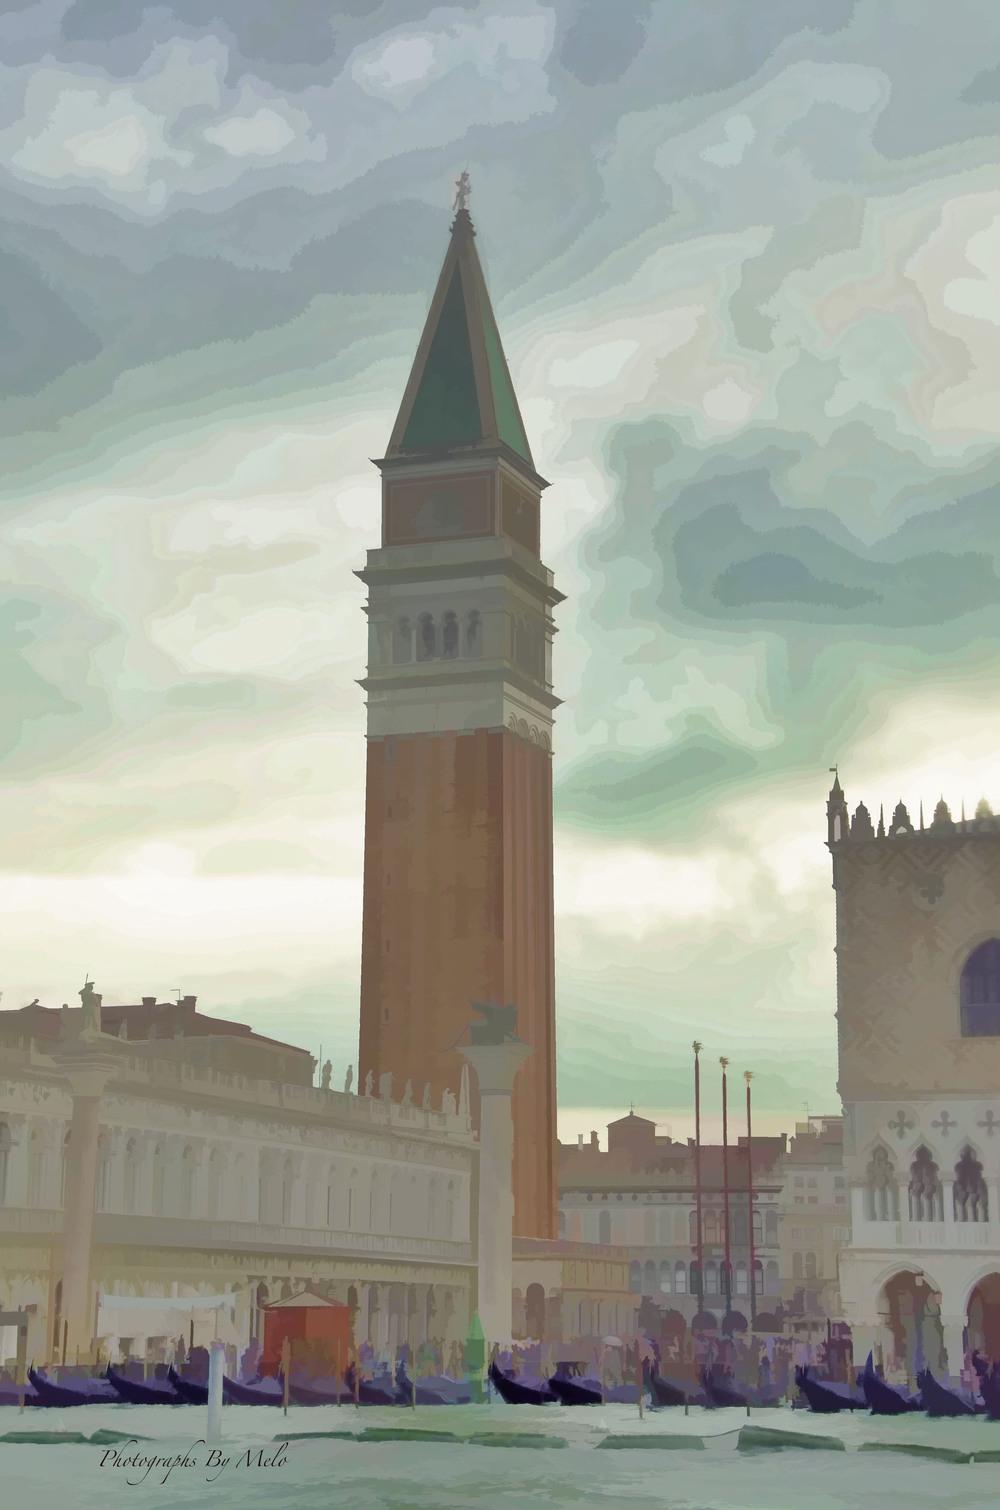 Tower at the Plaza De San Marco, Venice , Italy